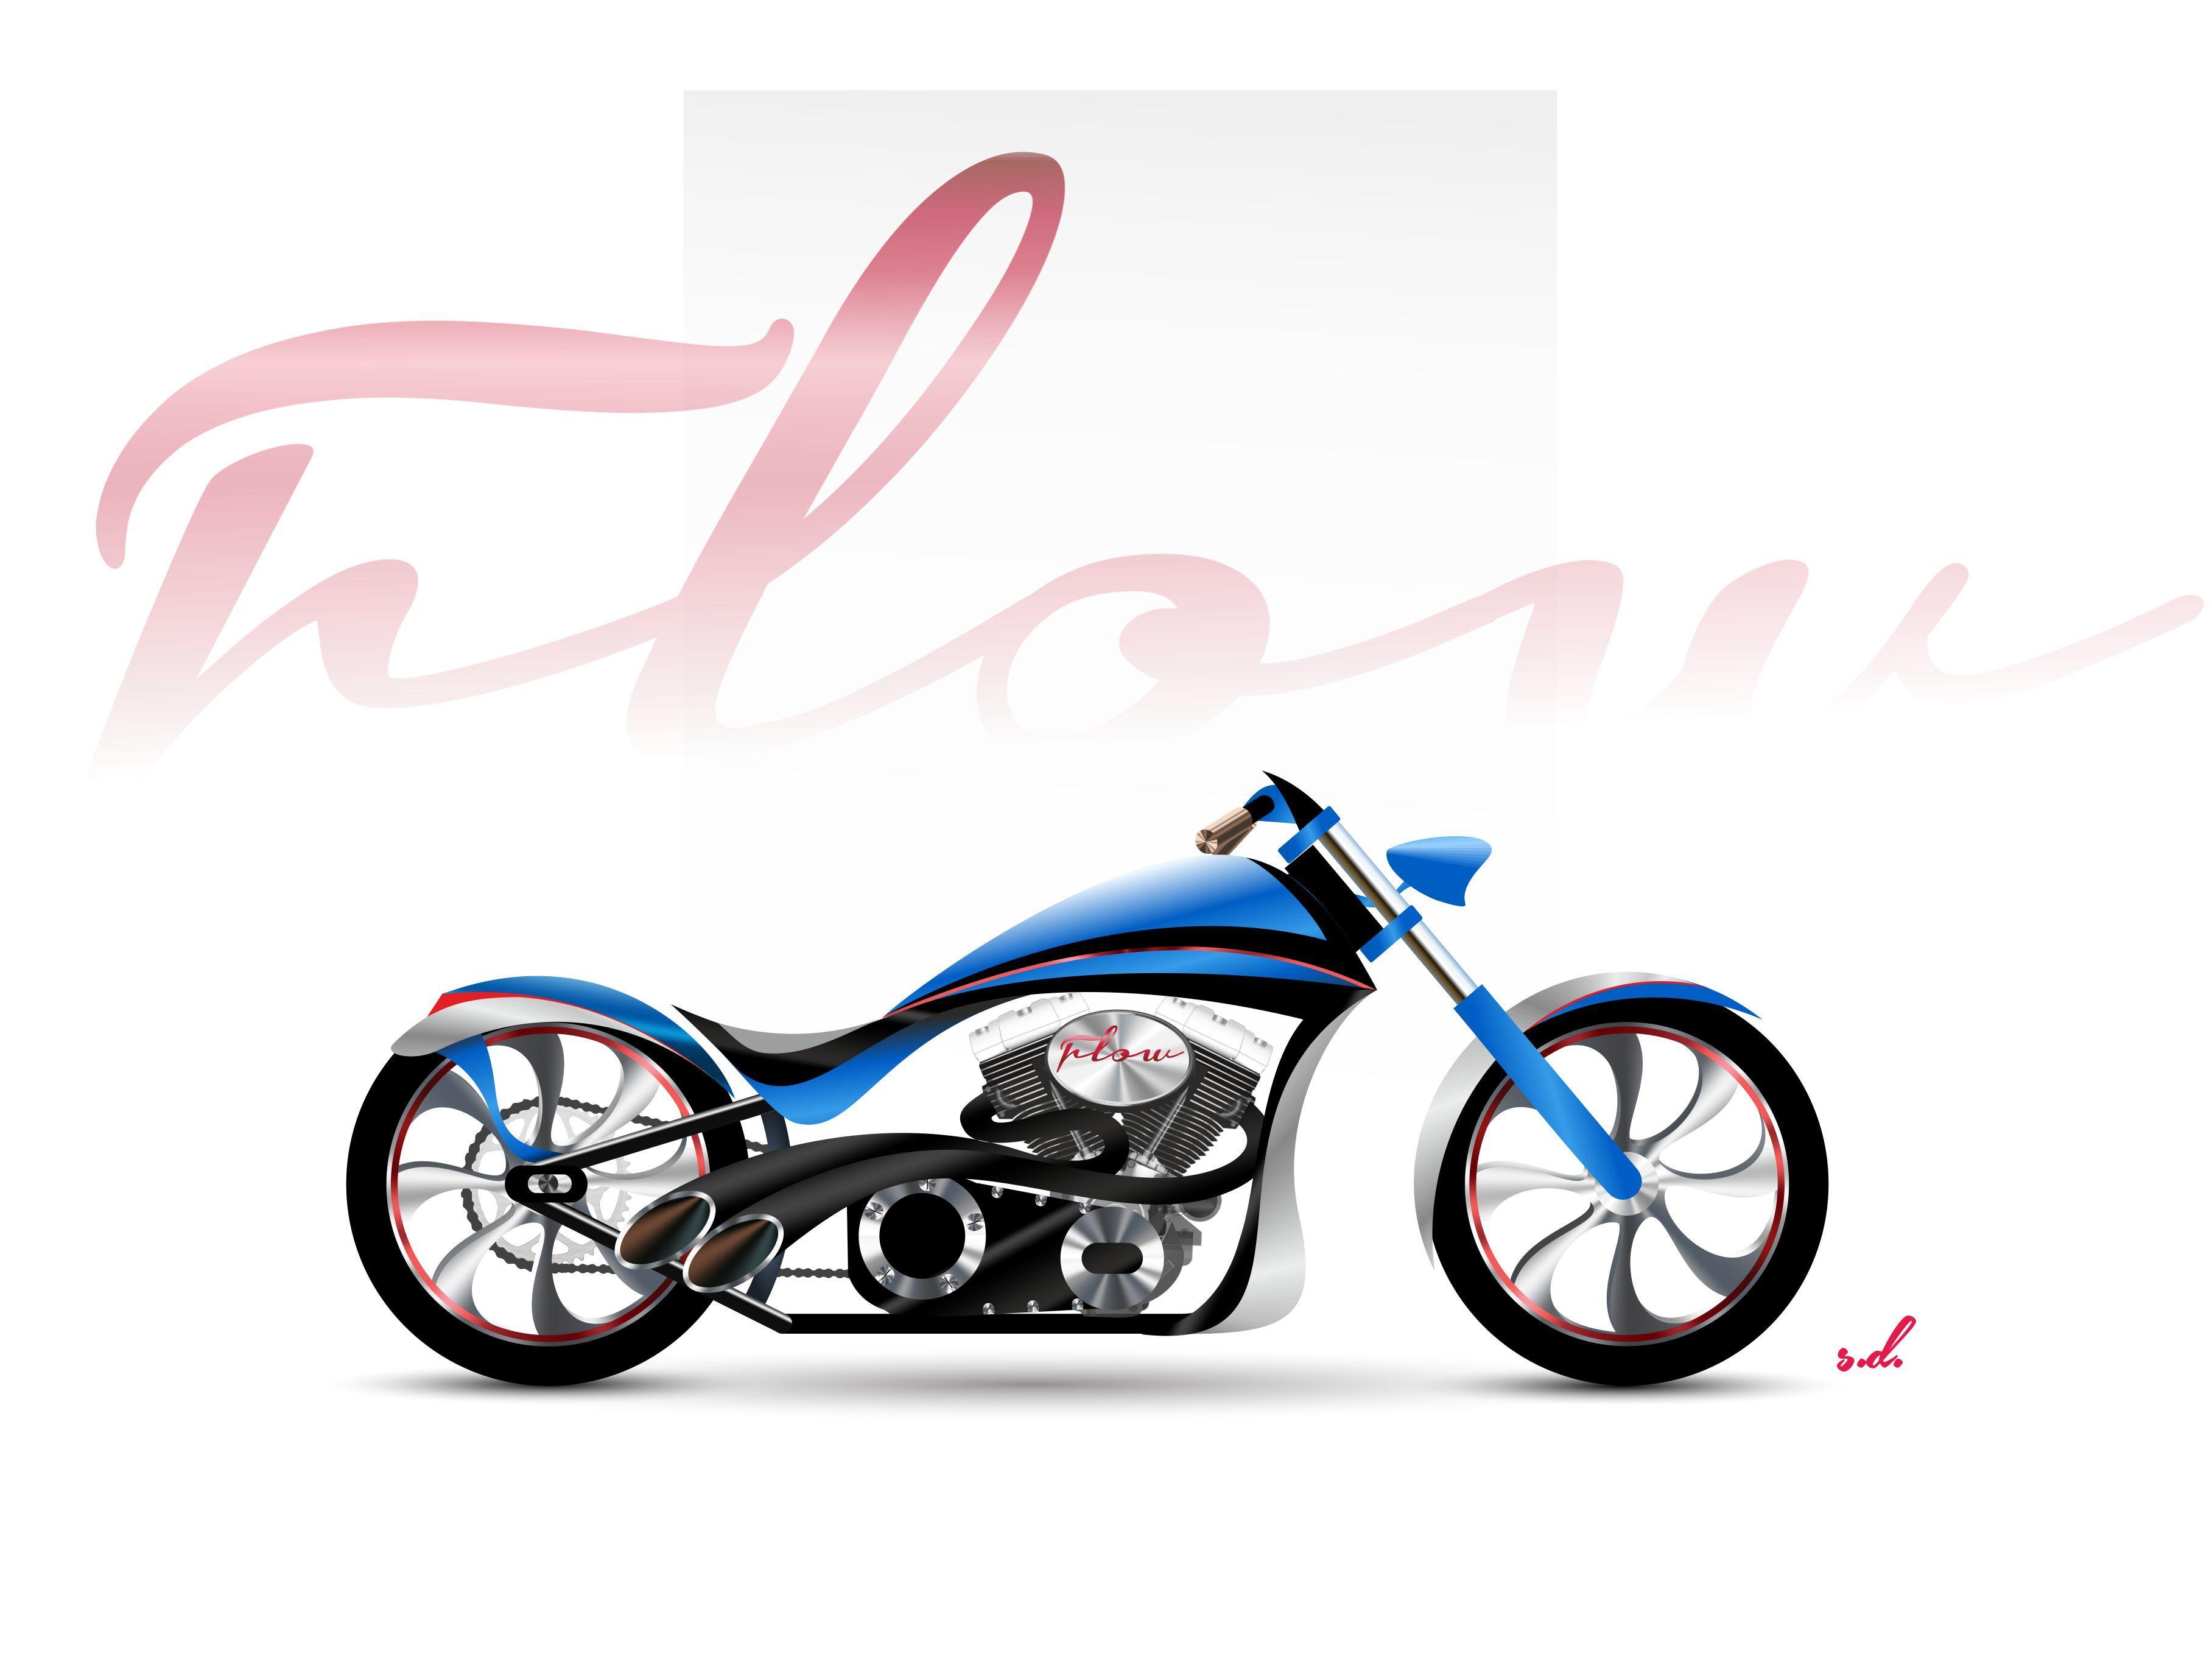 Flow - Custom Motorcycle Design Concept